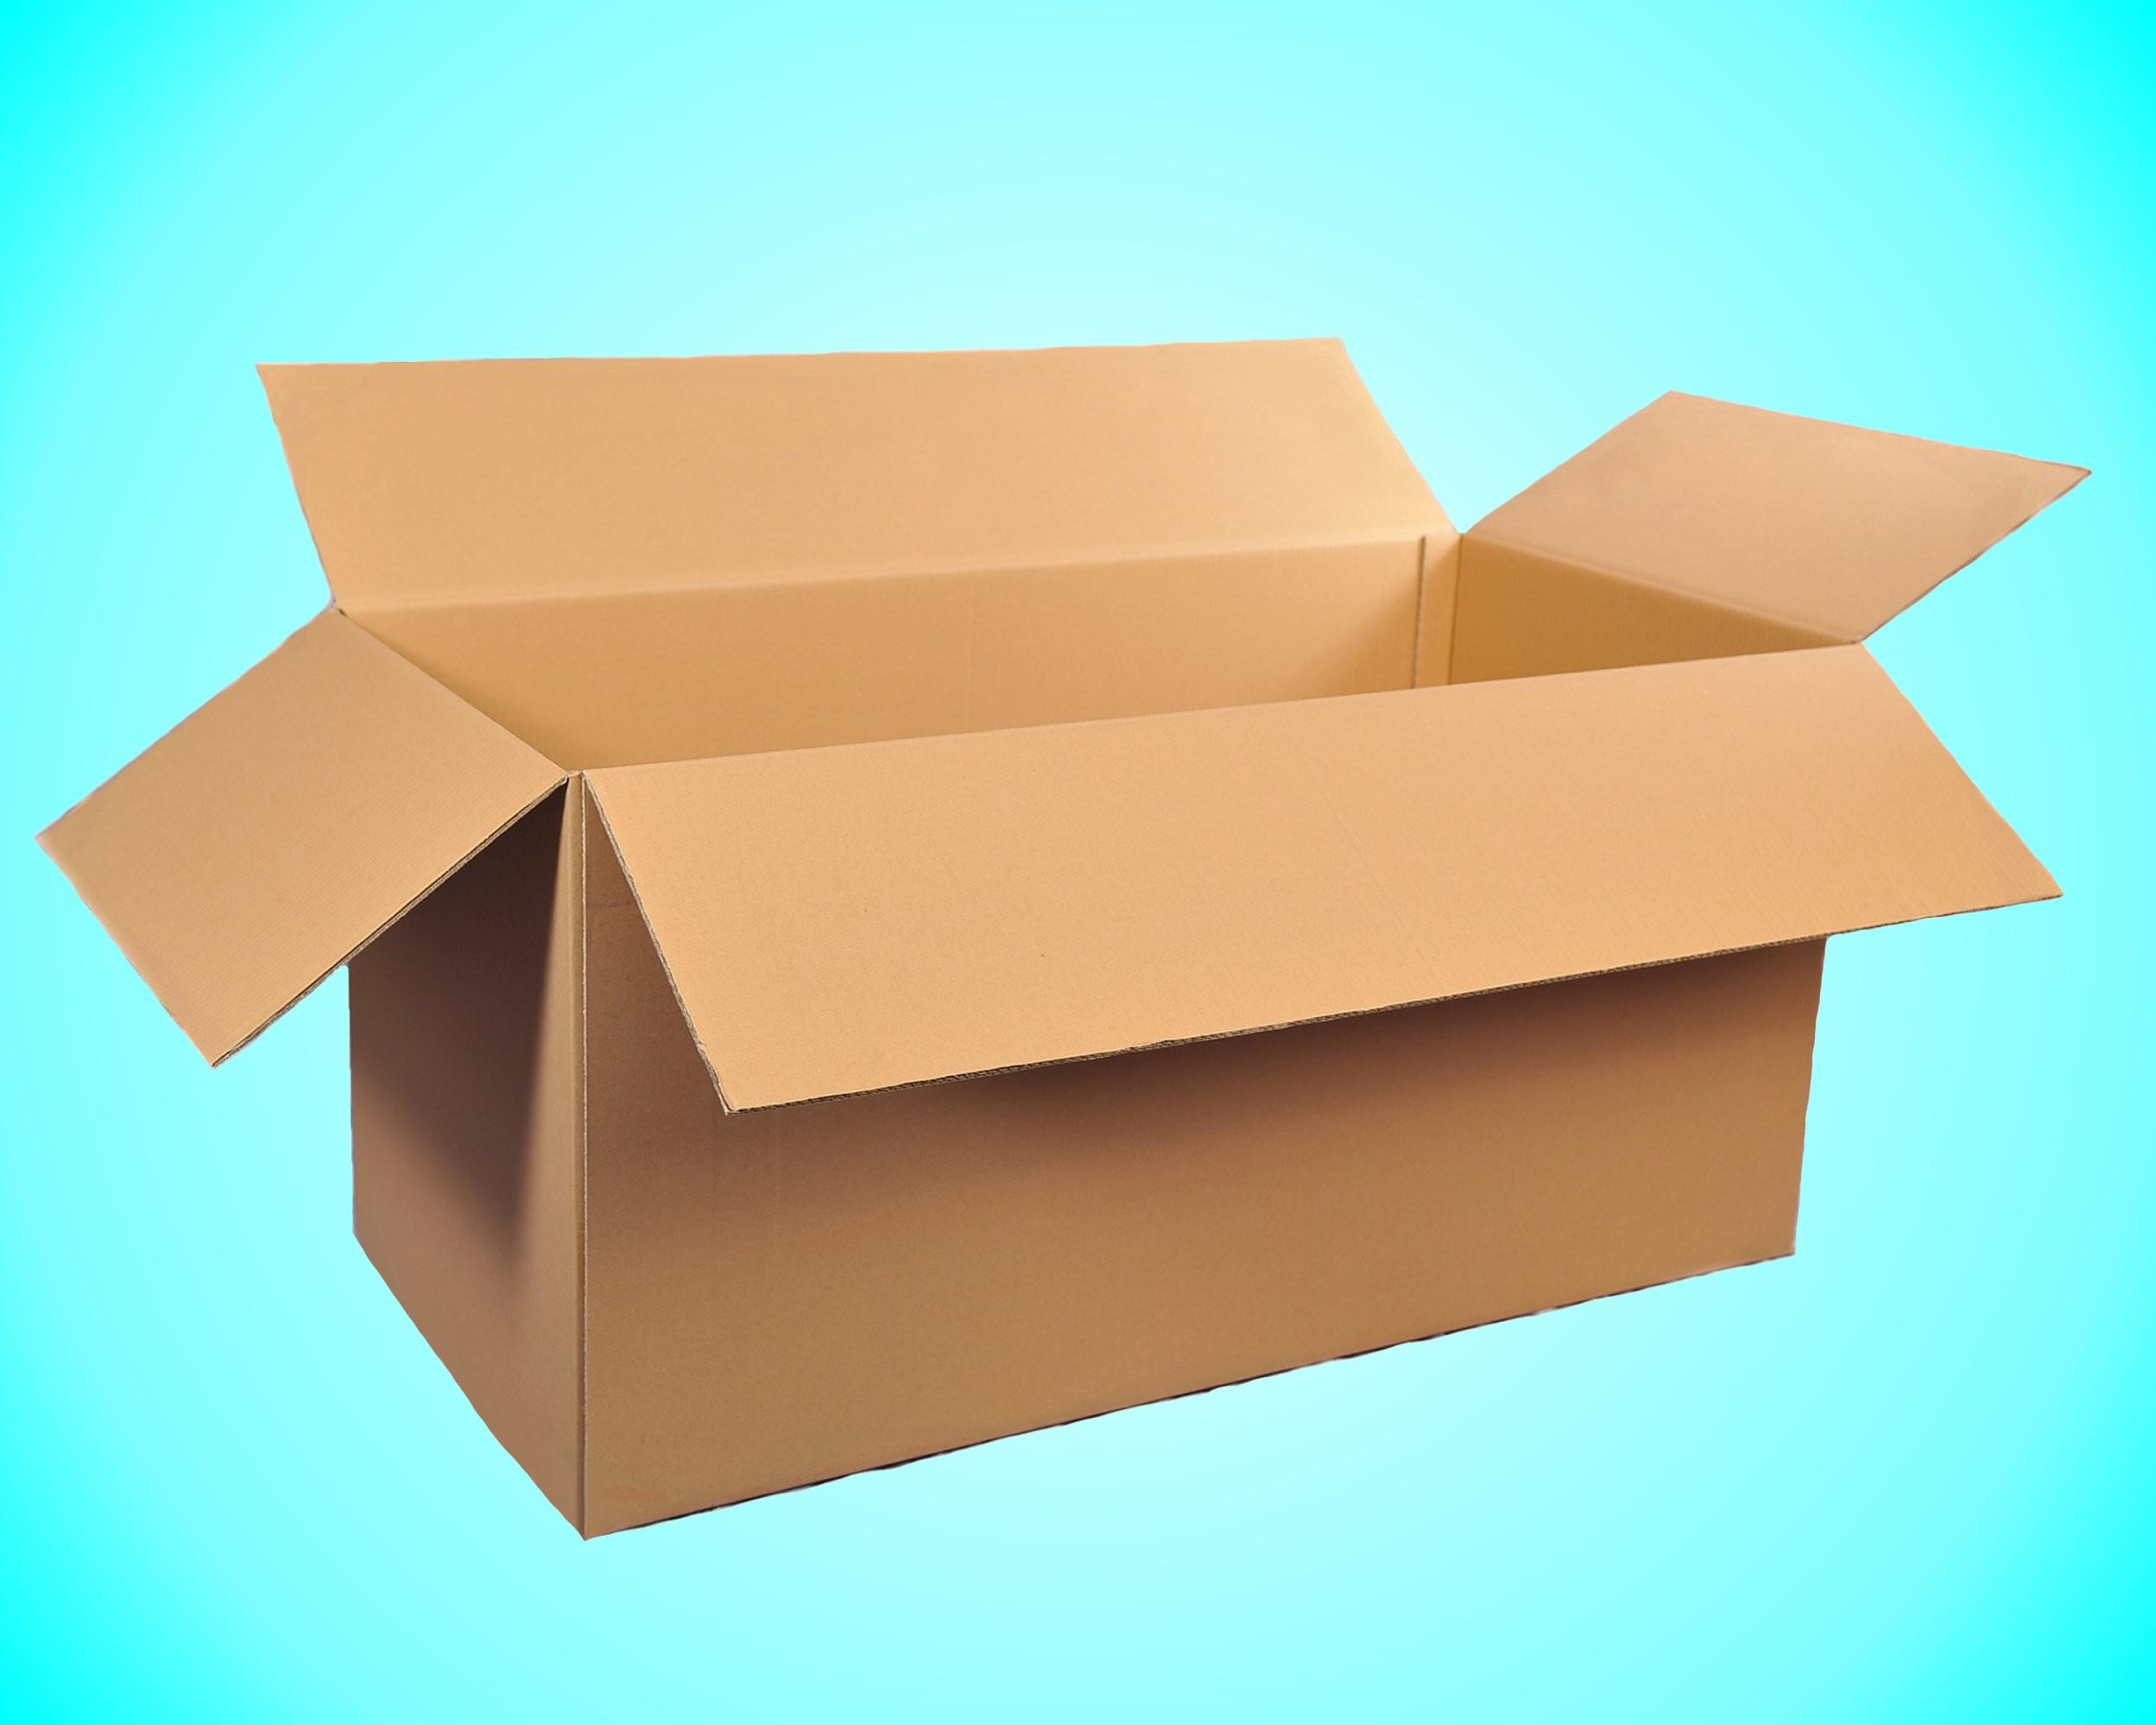 1000x600x600 karton faltkartons versandkarton 100x60x60 2. Black Bedroom Furniture Sets. Home Design Ideas